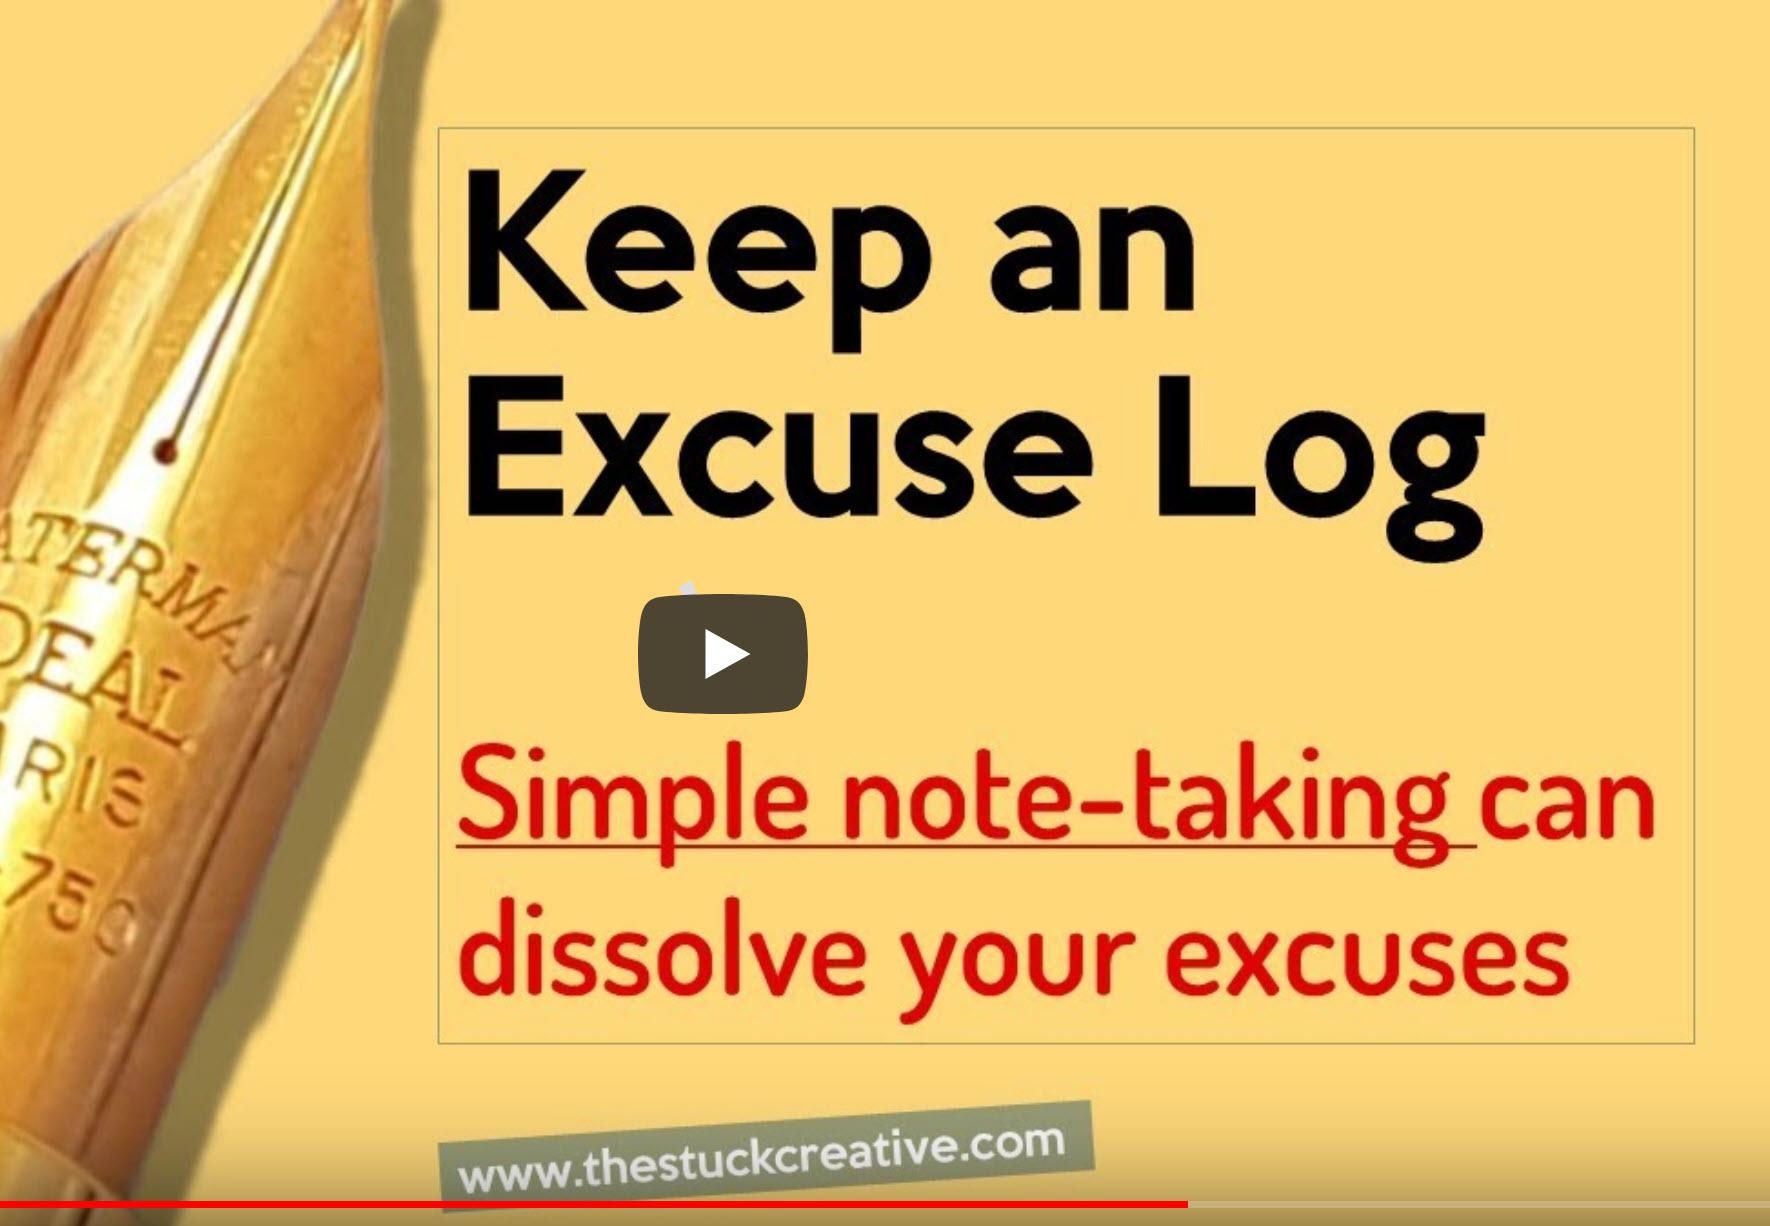 [Video] Keep an Excuse Log?